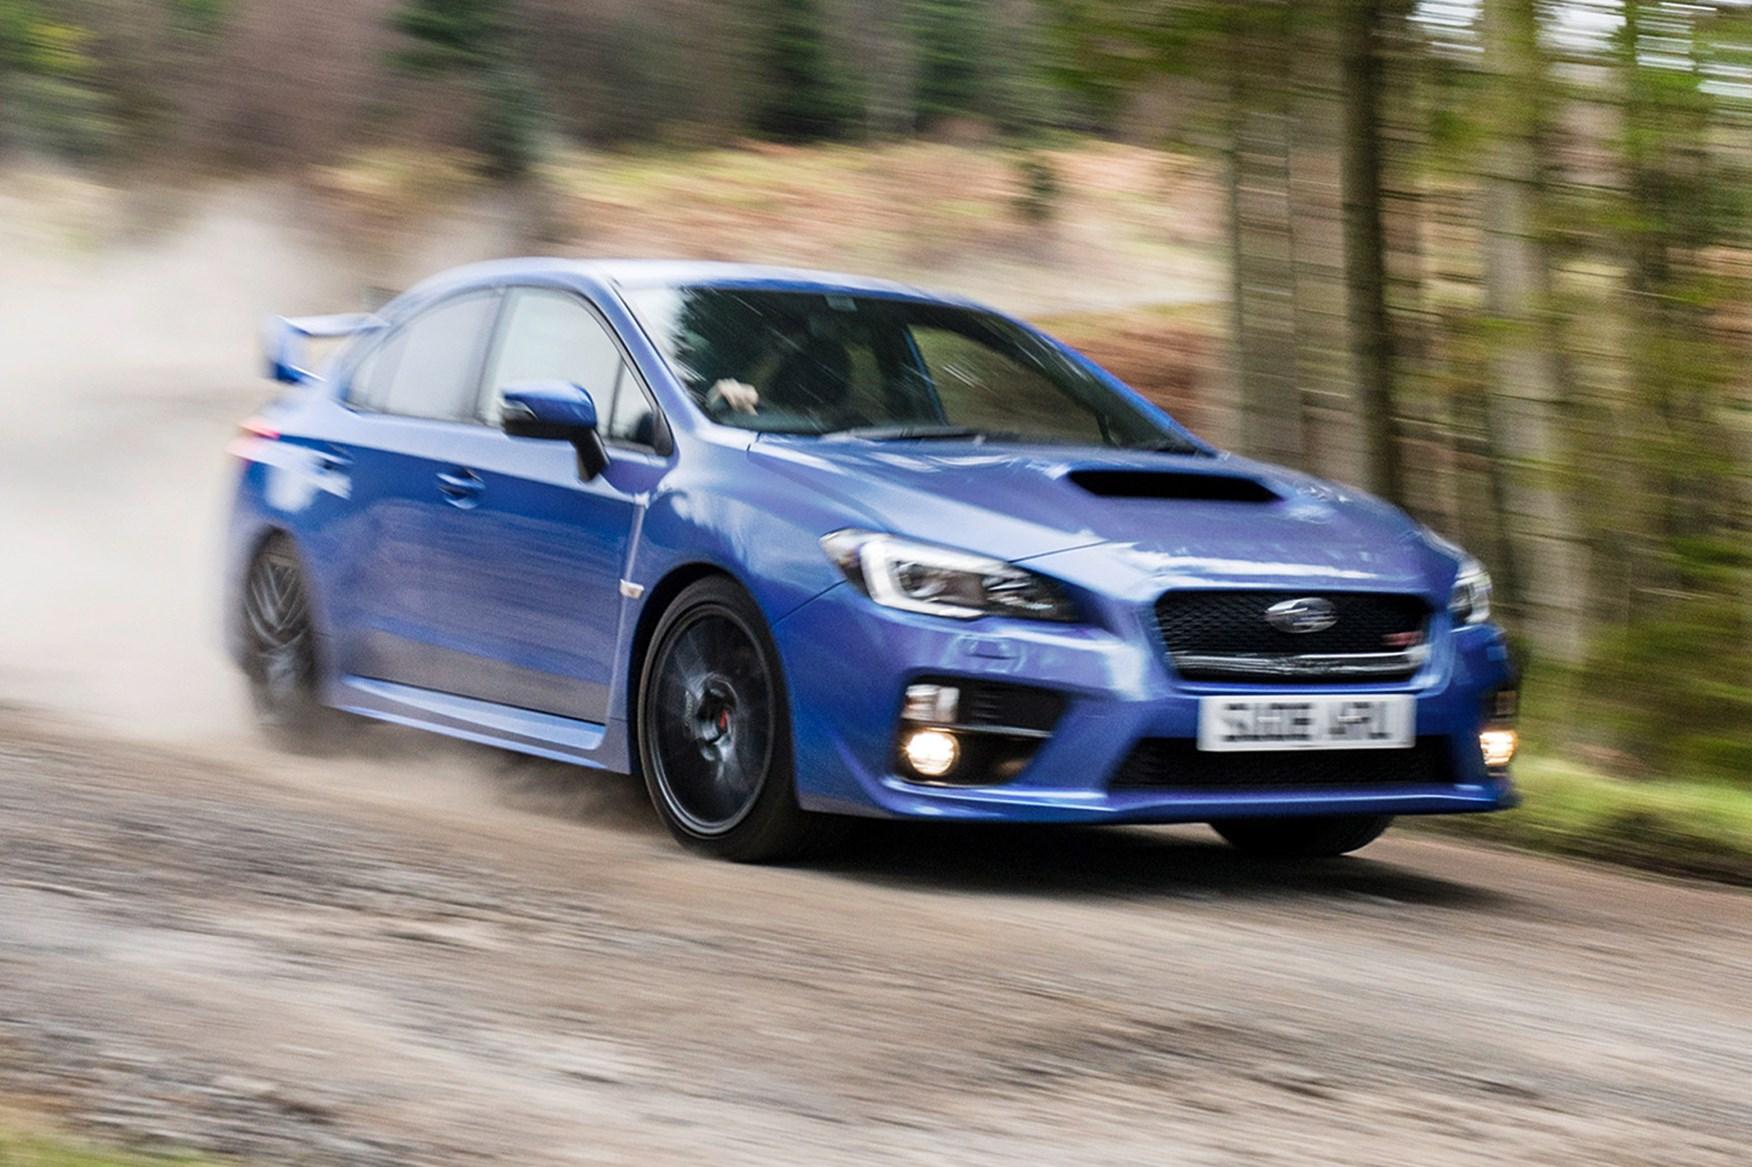 Subaru WRX STI 2016 long term test review by CAR Magazine